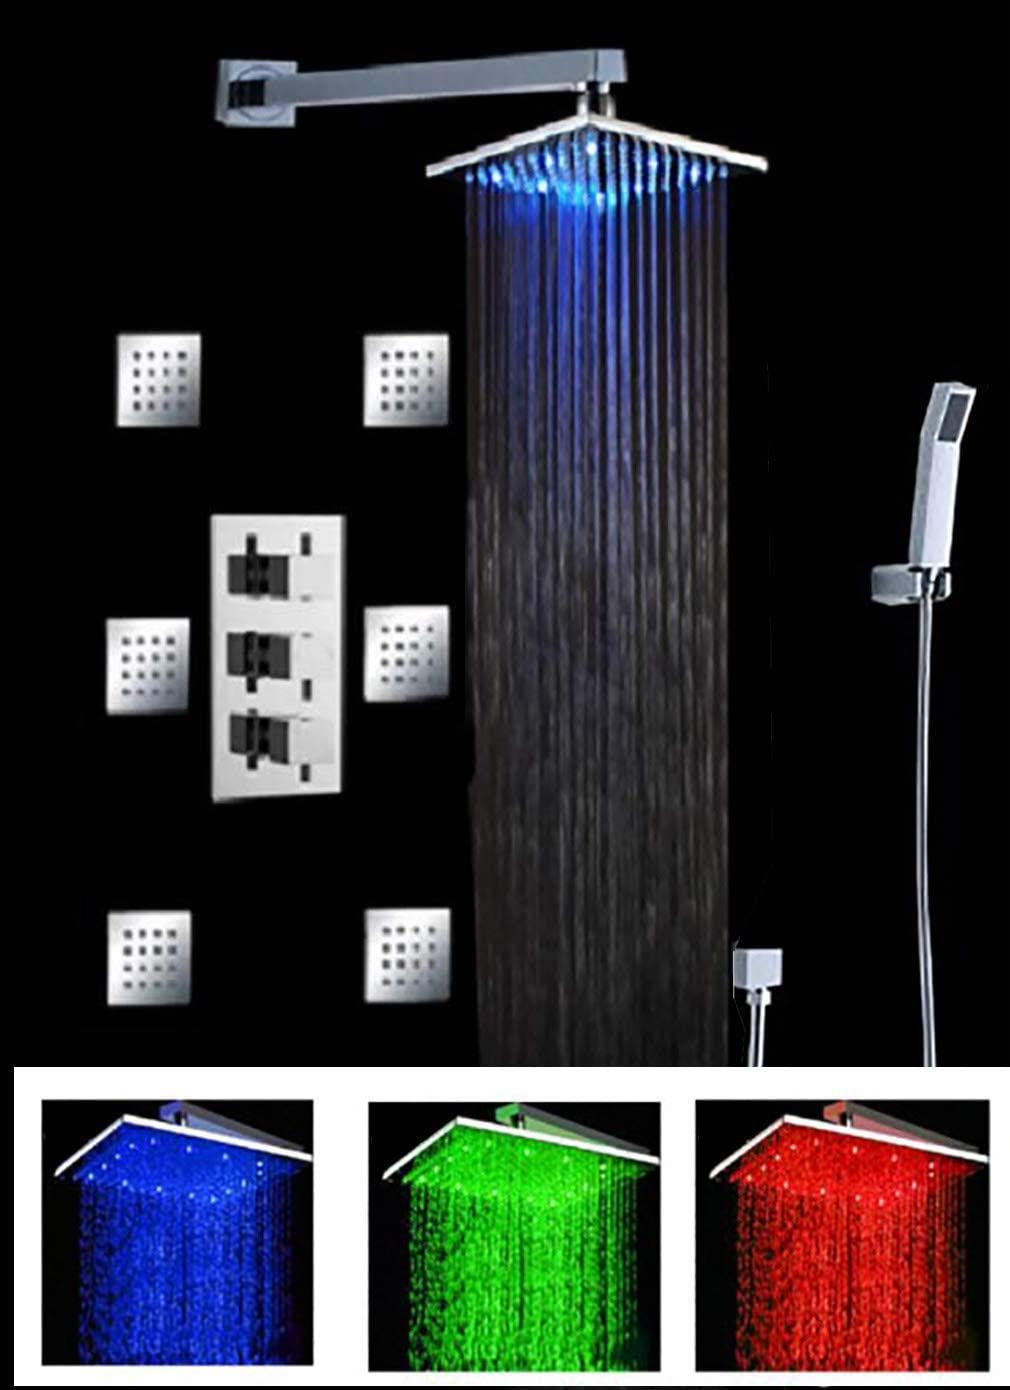 Cascada Luxury Bathroom Shower Set with Luxury Water Power LED Shower Head (Wall Mount) Rainfall Thermostatic 6 Massage Jets Spray Body Shower Set (10